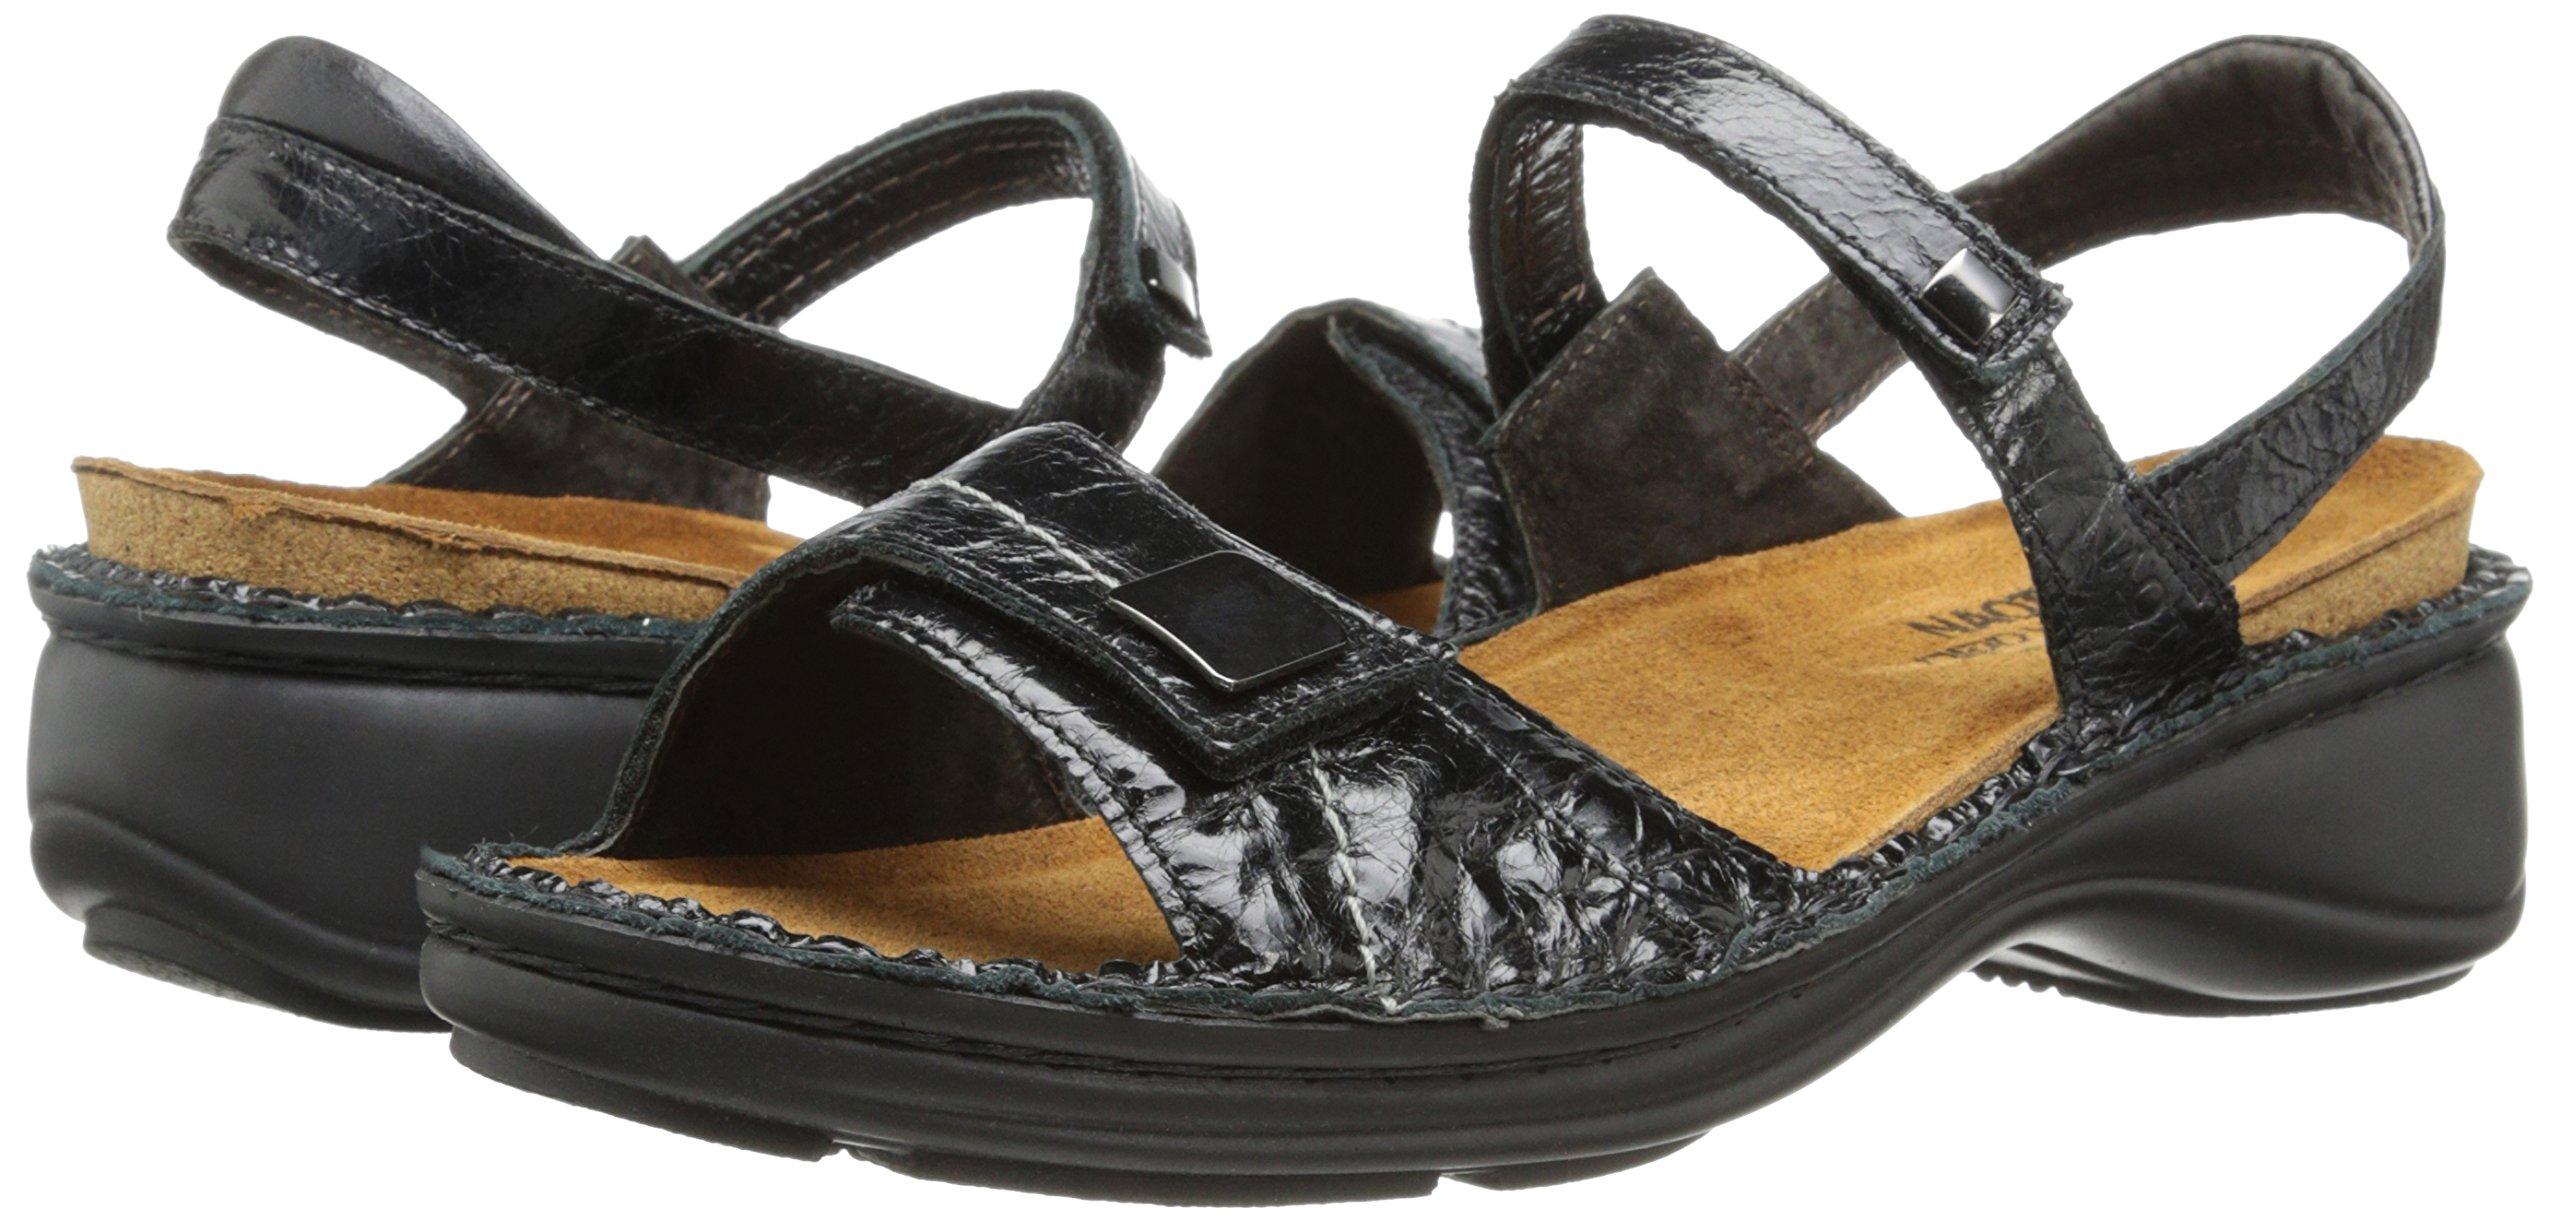 Naot Women's Papaya Flat,Black Madras Leather,40 EU/8.5-9 M US by NAOT (Image #6)